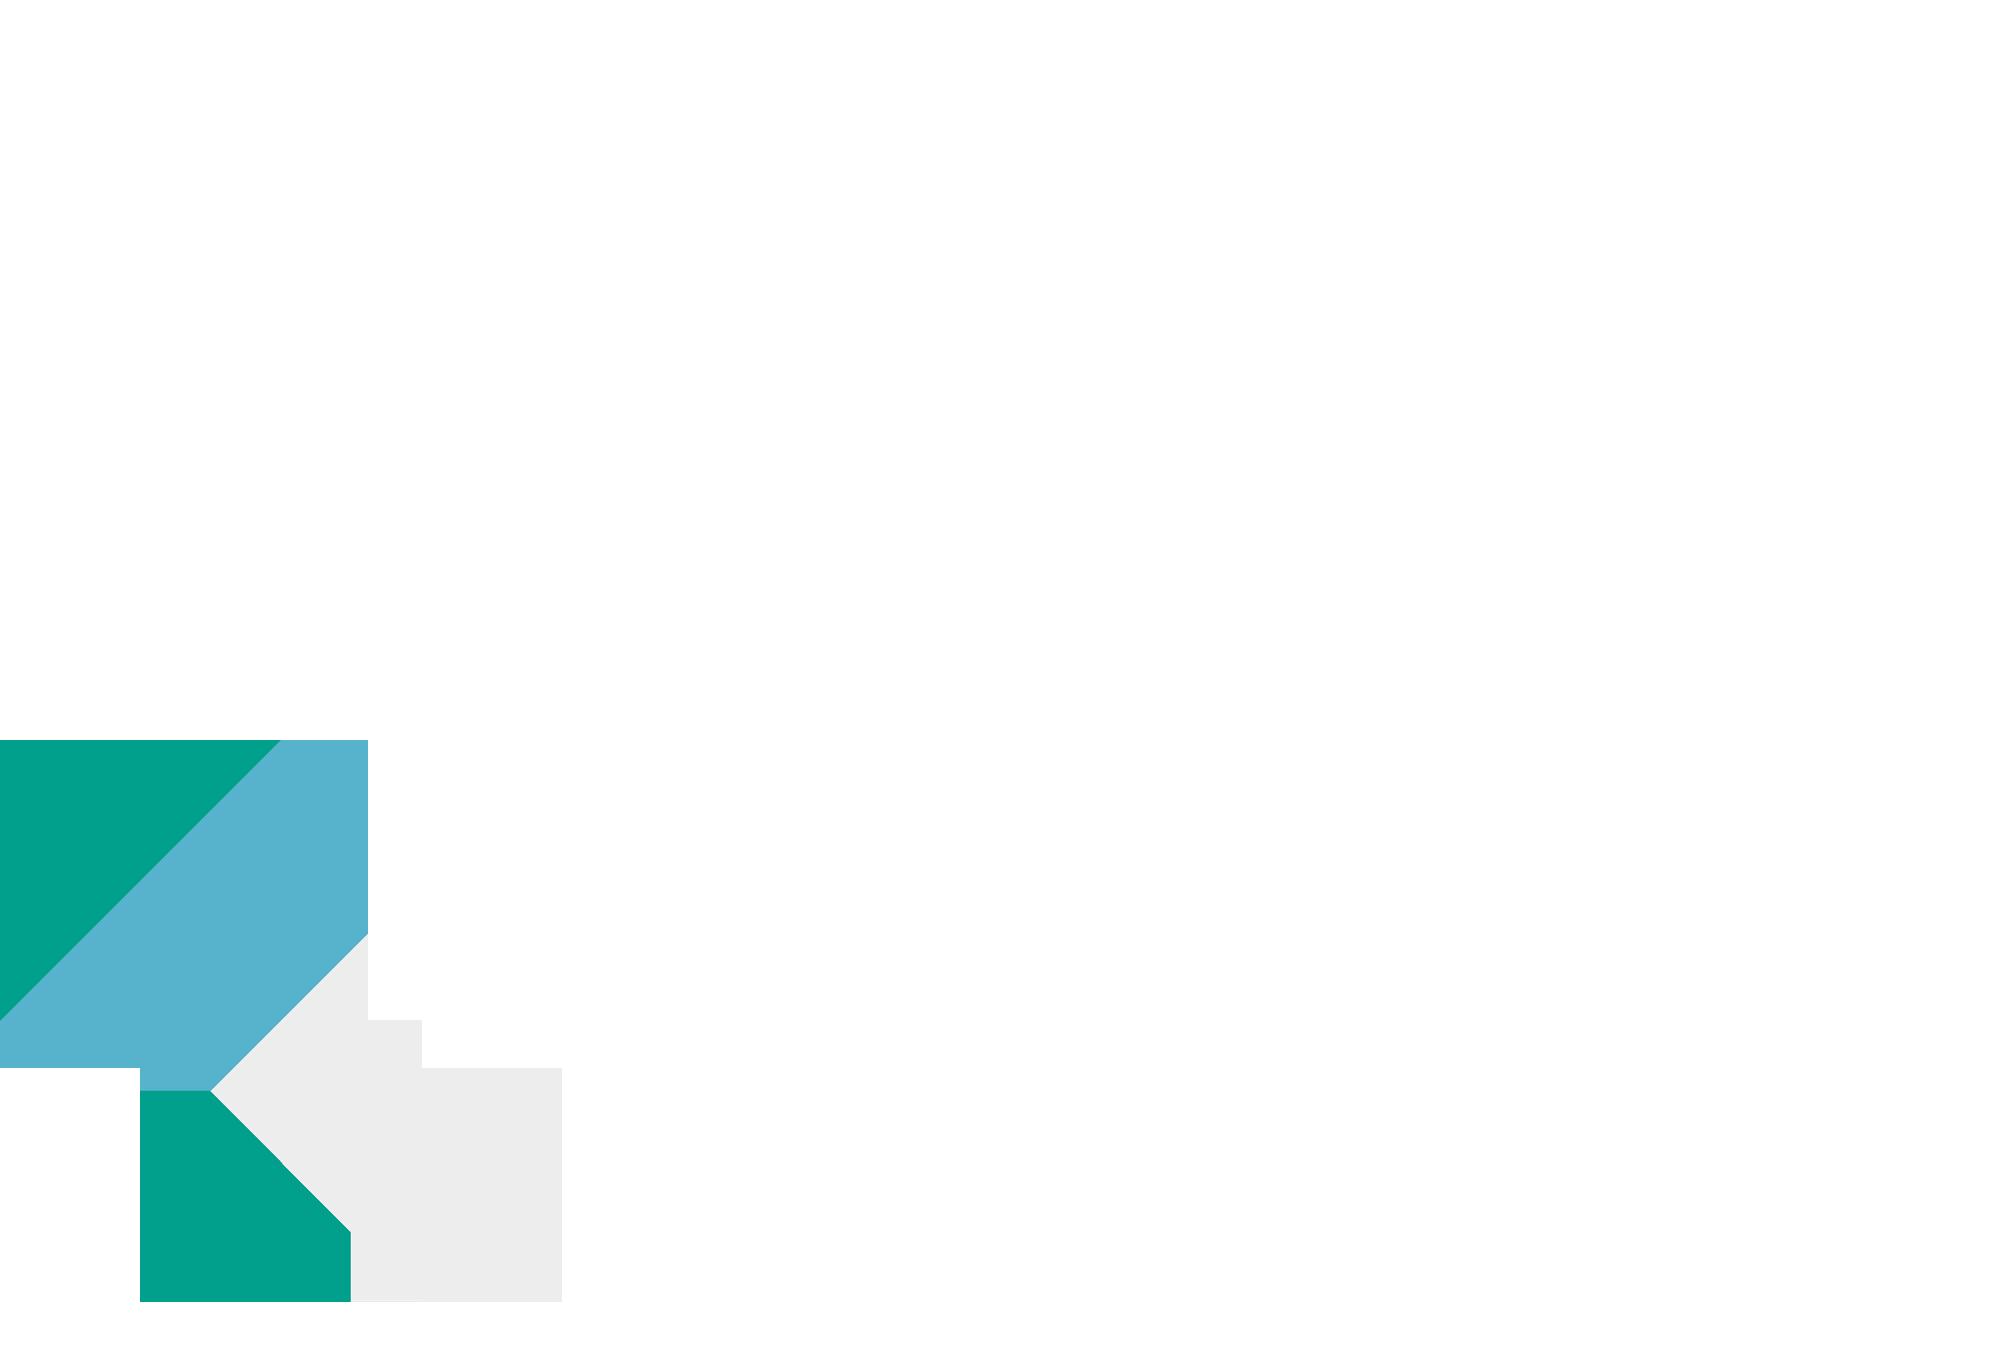 Brand Elite - What We Do - Block Box Design 3